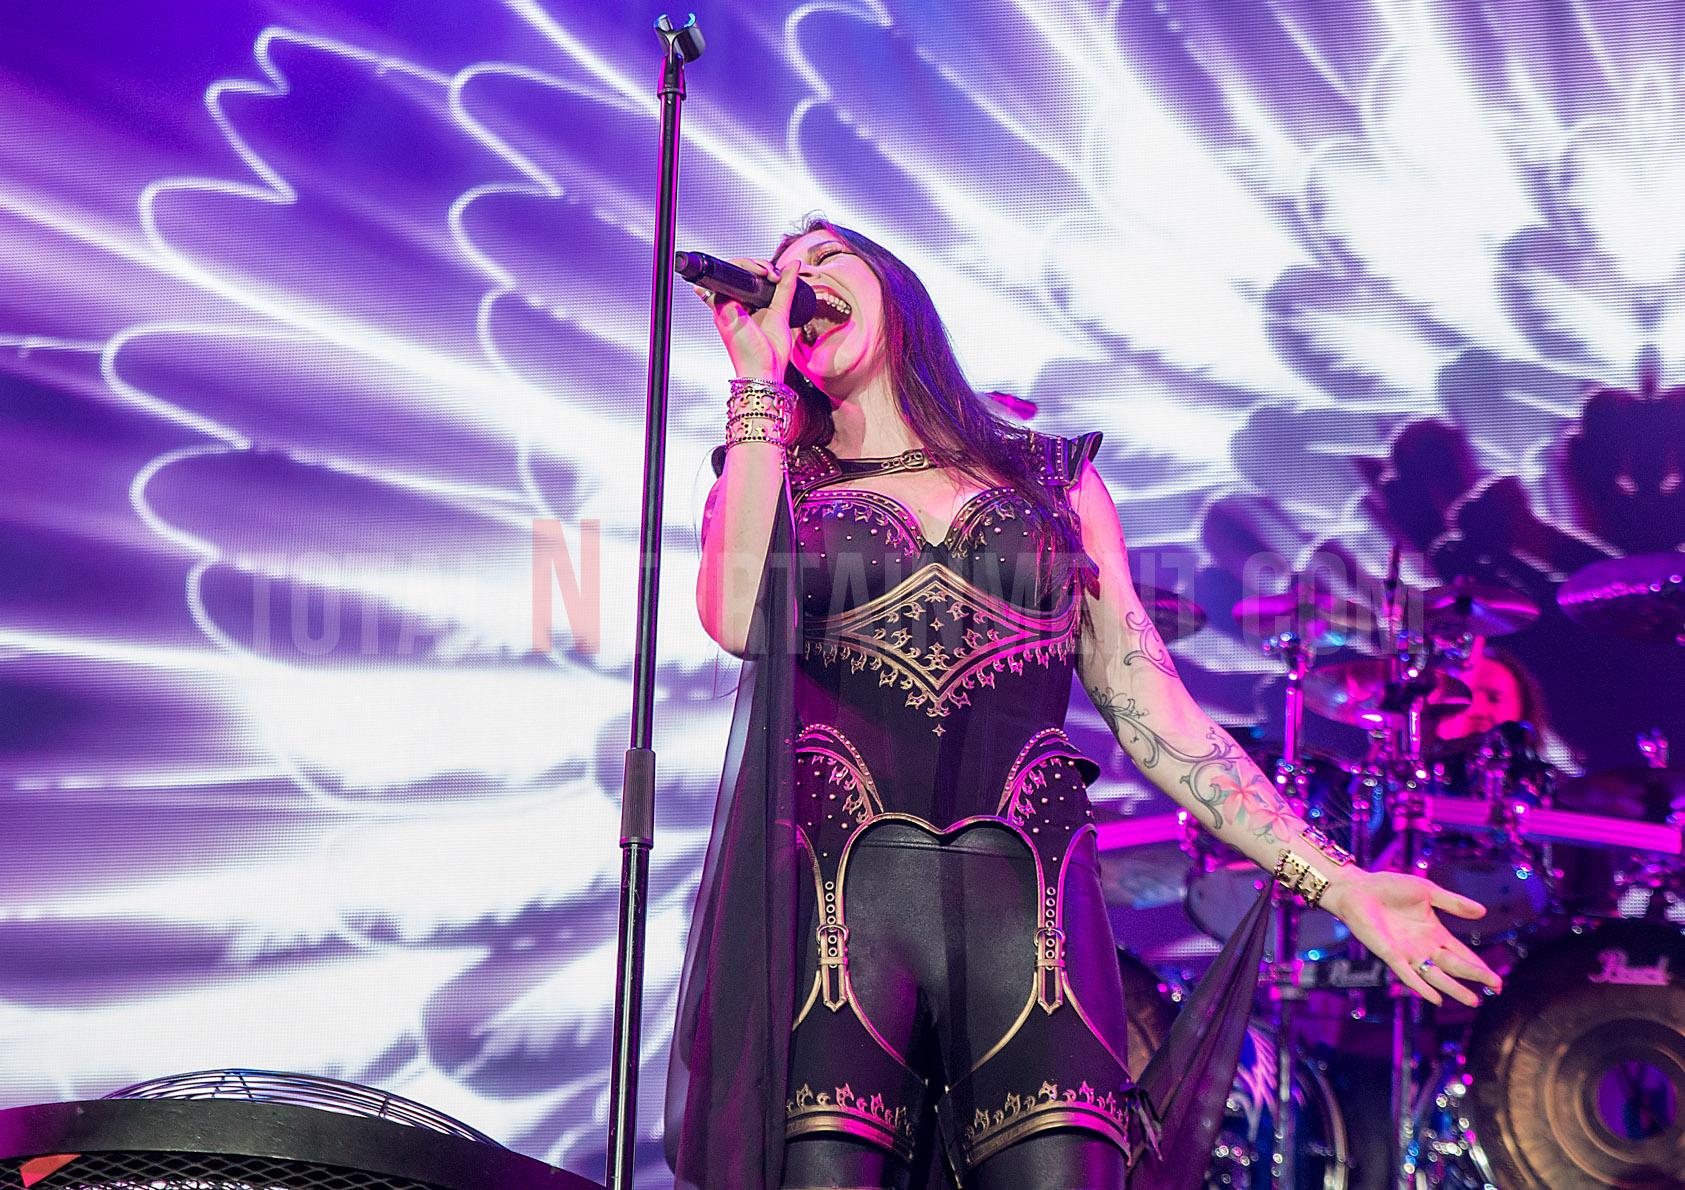 Nightwish put on thunderous show in Manchester